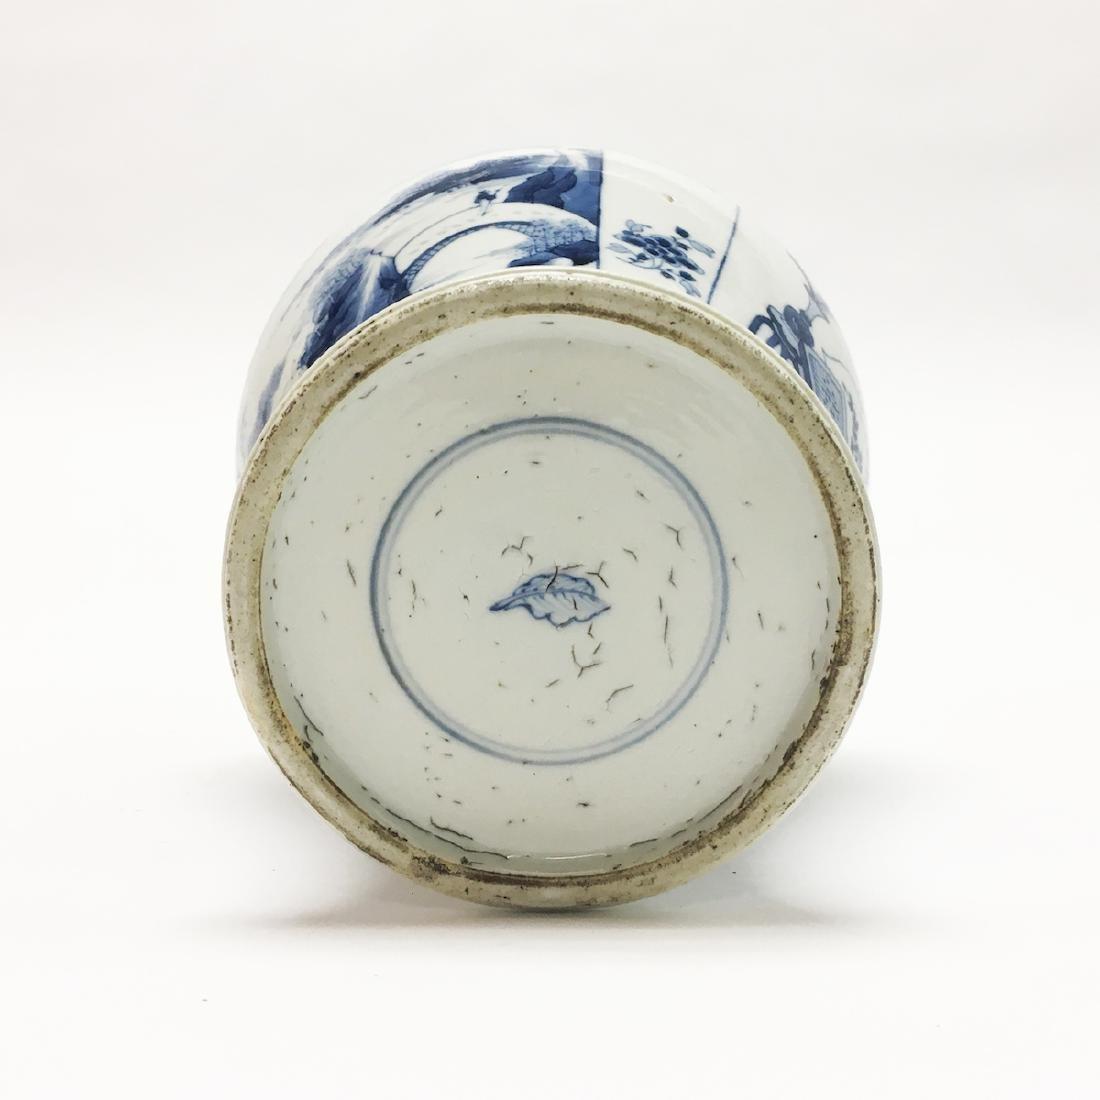 Chinese Porcelain Blue and White Vase - 4